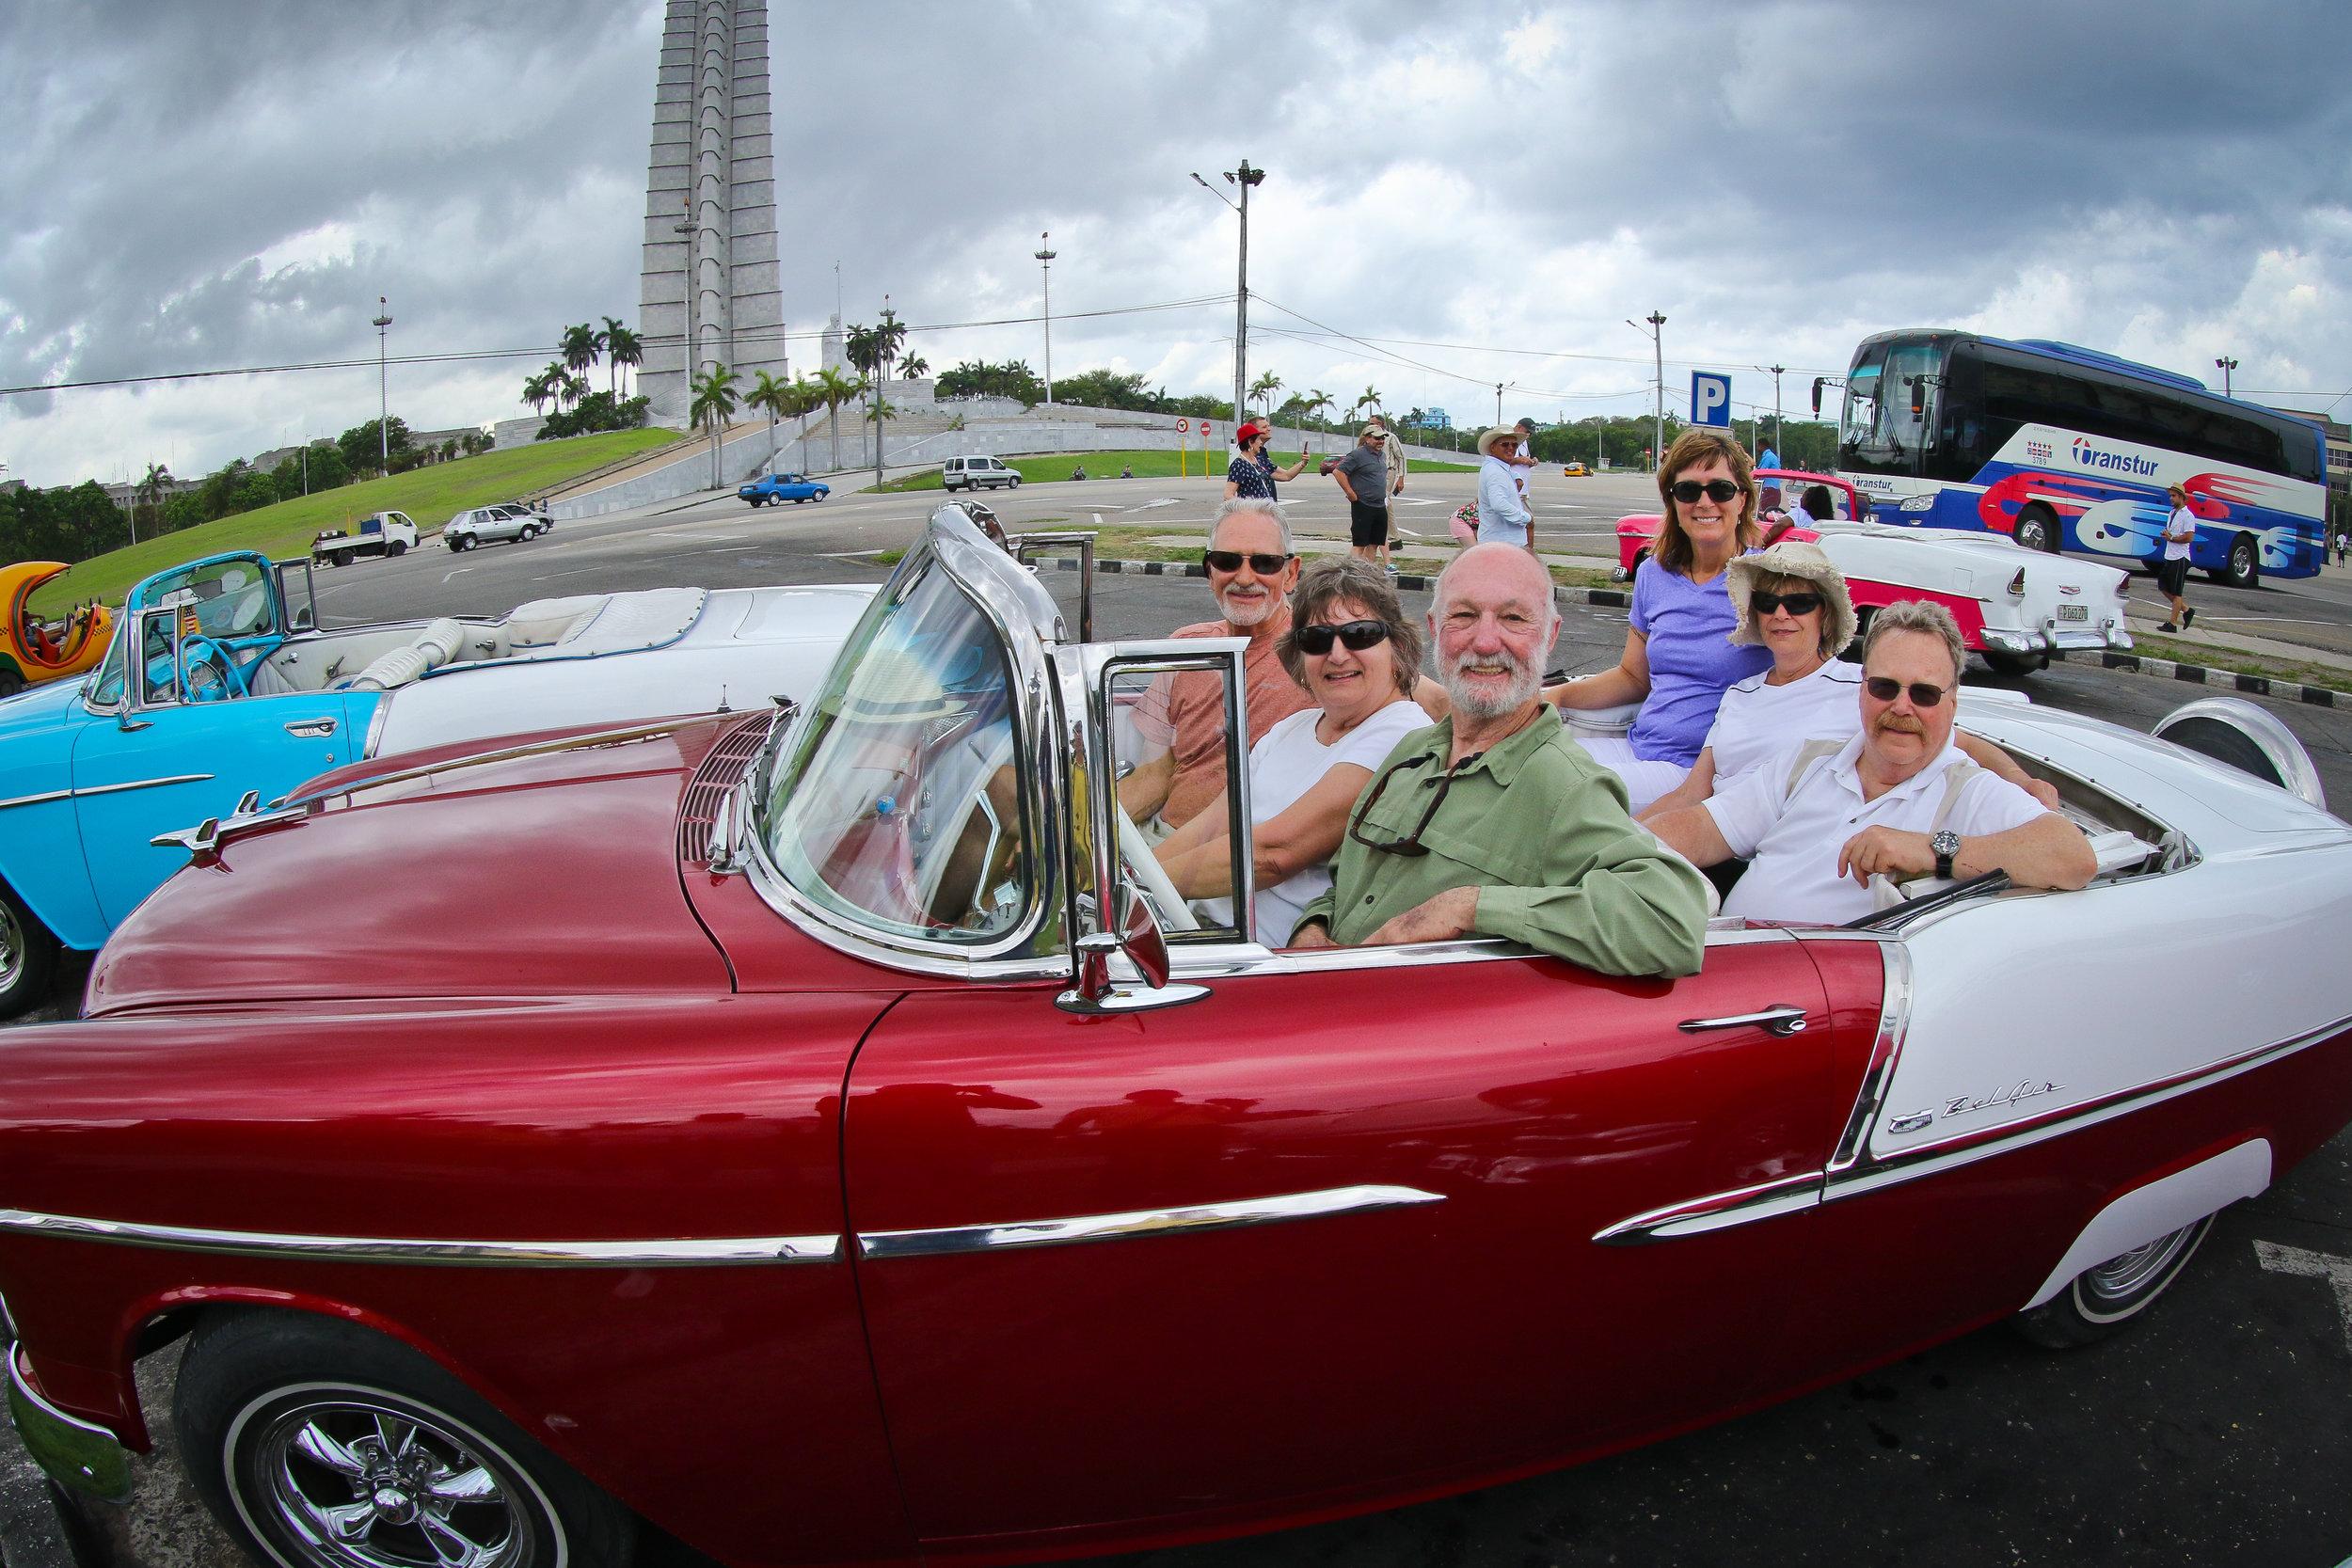 Guests enjoy Havana in an American classic